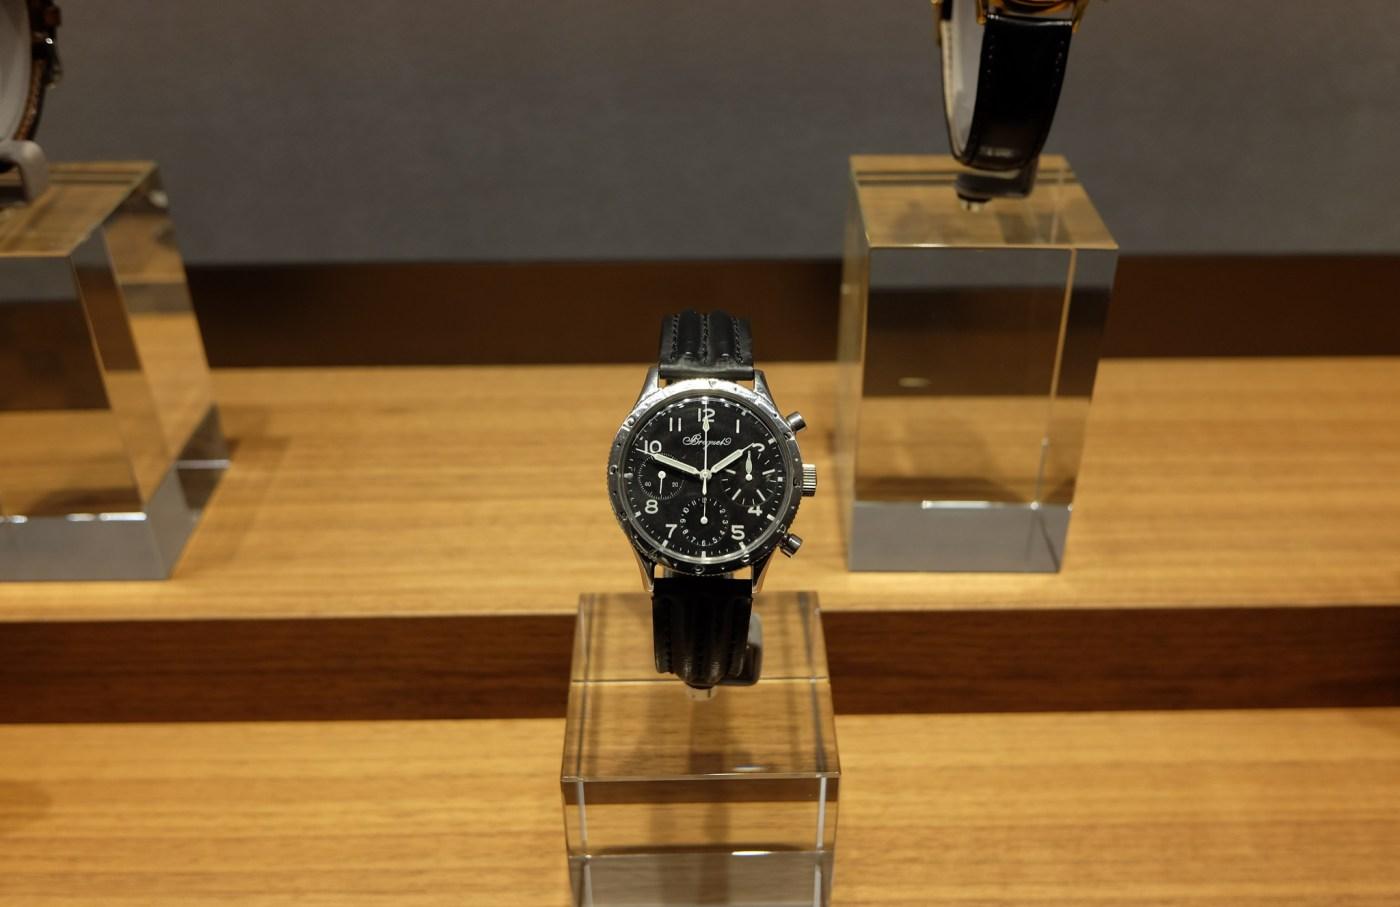 Type 20 wristwatch chronograph